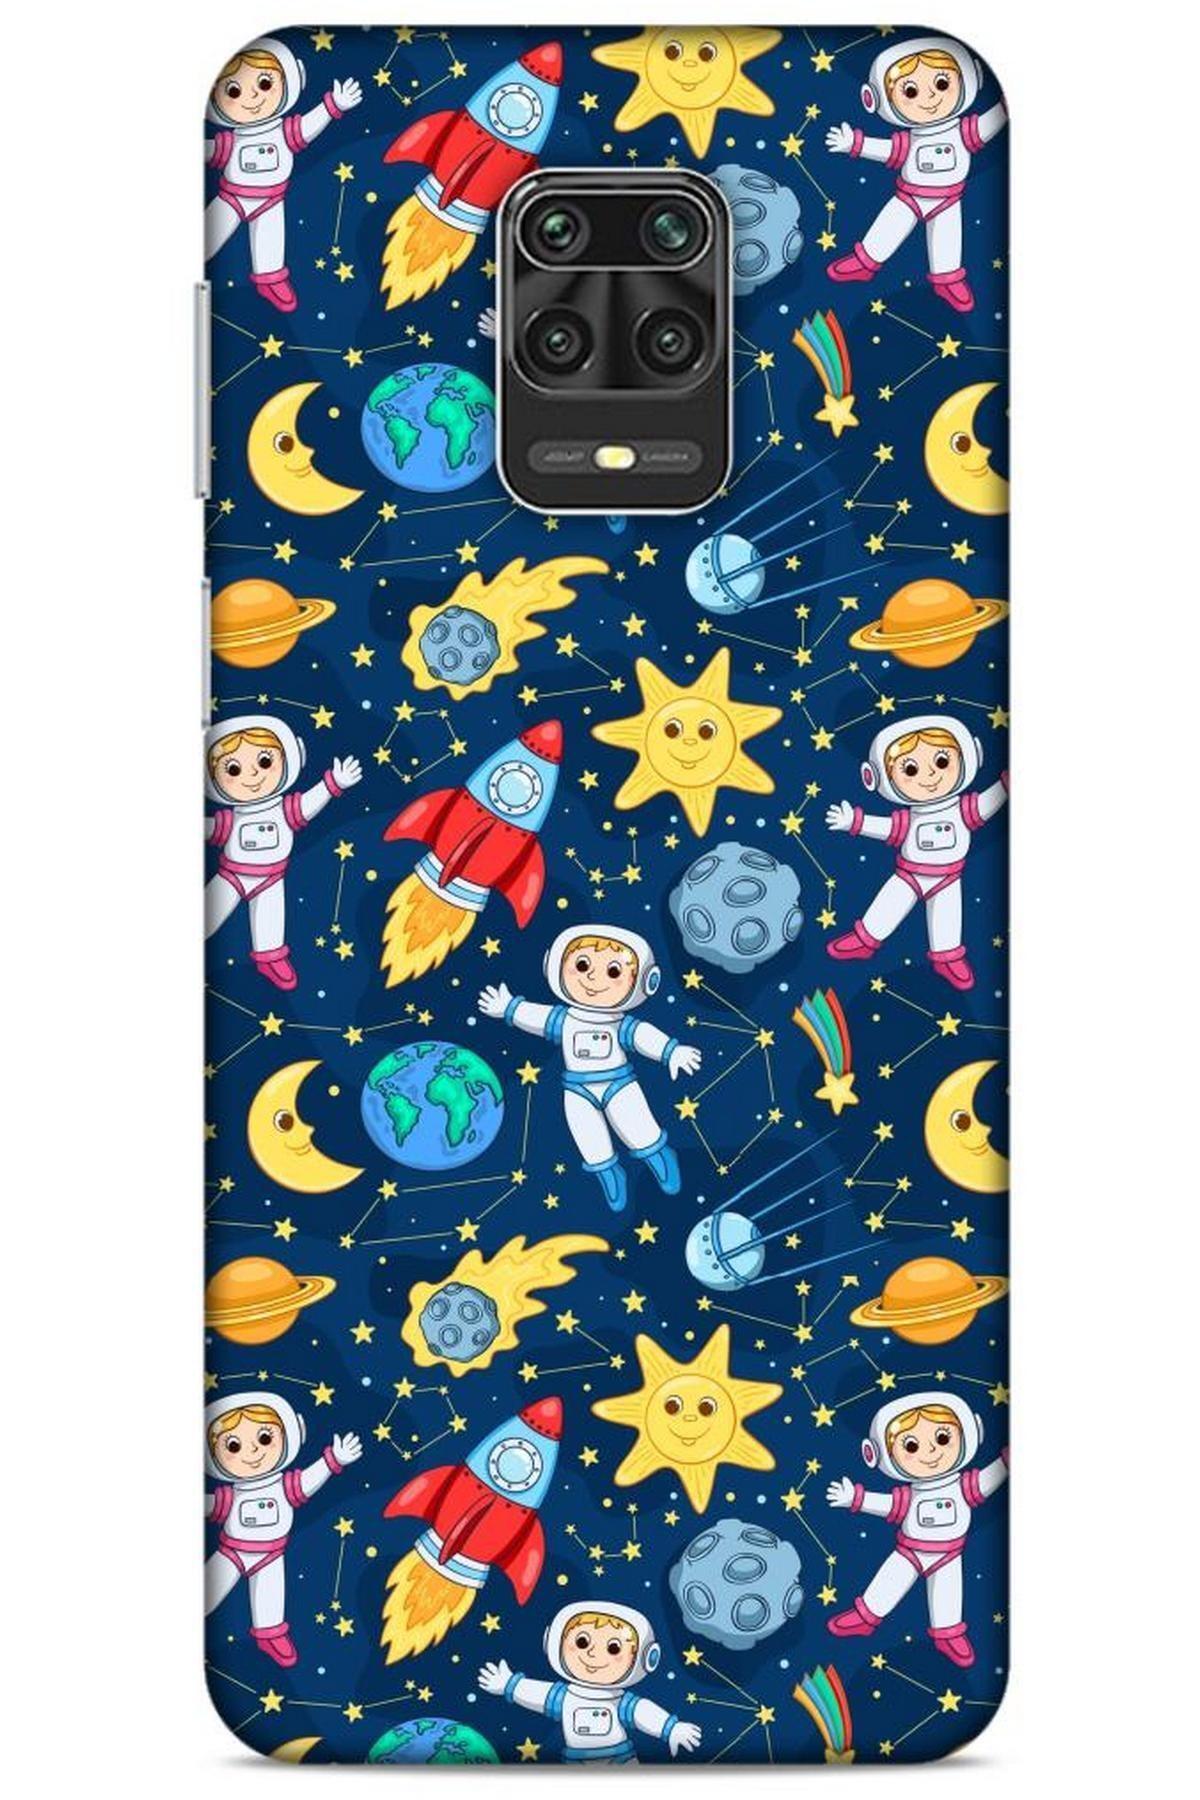 Lopard Spacex (7) Tema Telefon Kılıfı Xiaomi Redmi Note 9s Kılıf 1